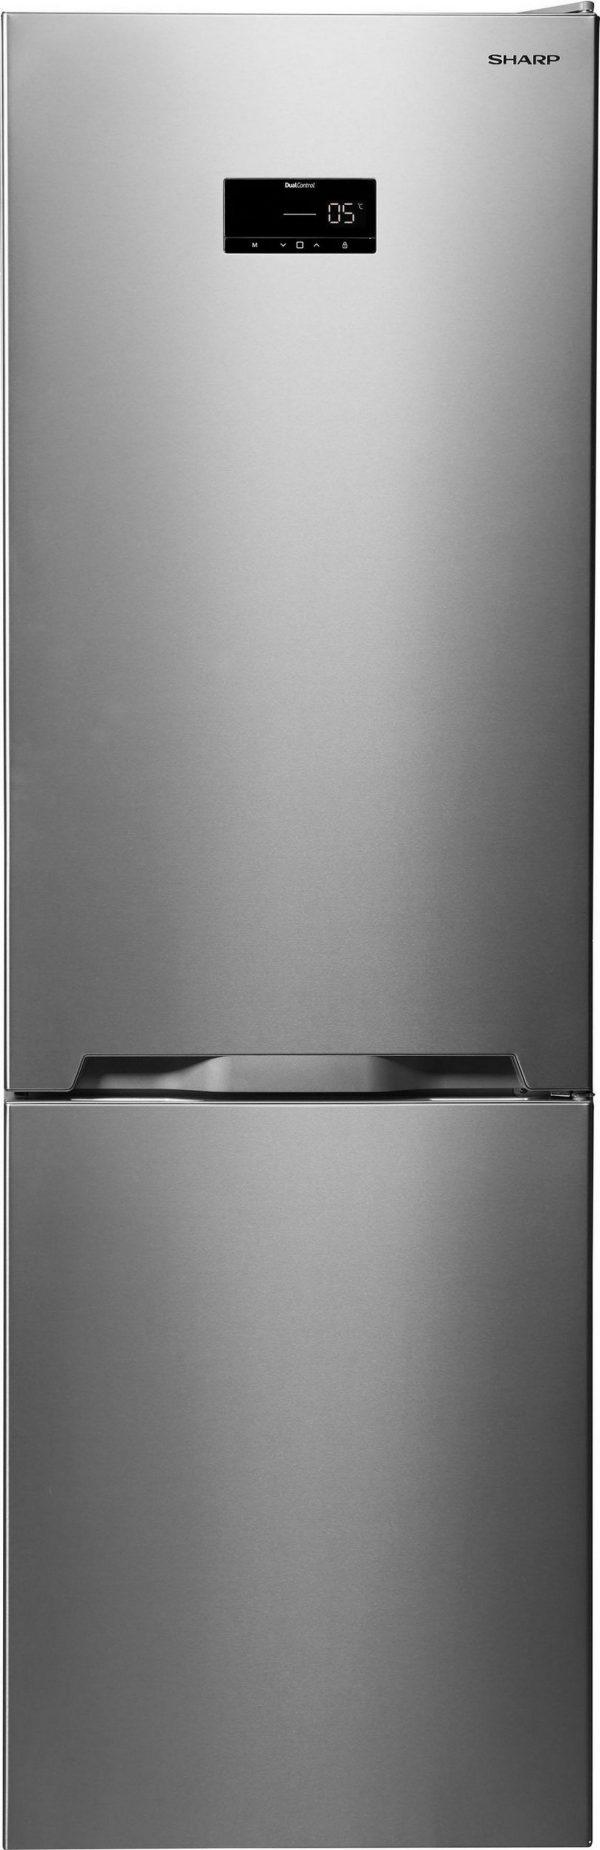 Хладилник Sharp SJ-BA10IHXI3-EU No-frost